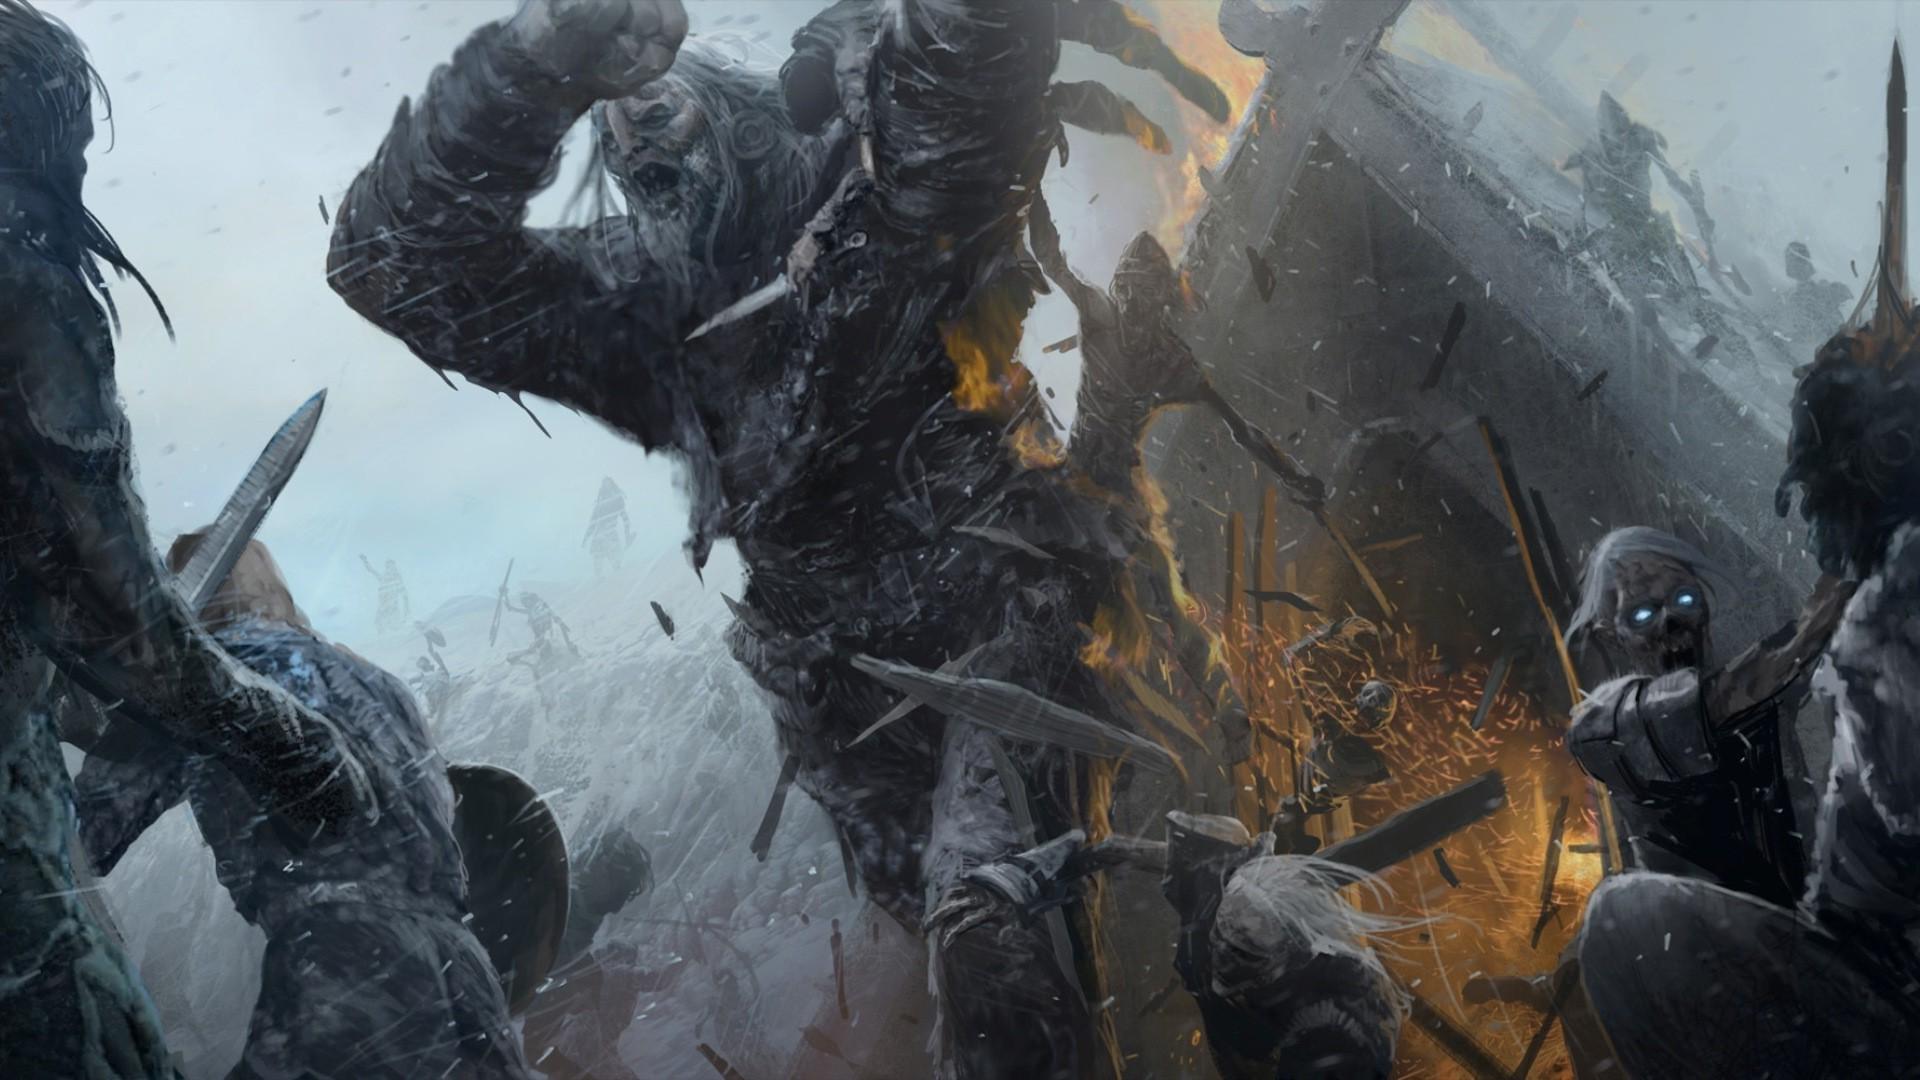 Hintergrundbilder Fantasiekunst Soldat Game Of Thrones Riese